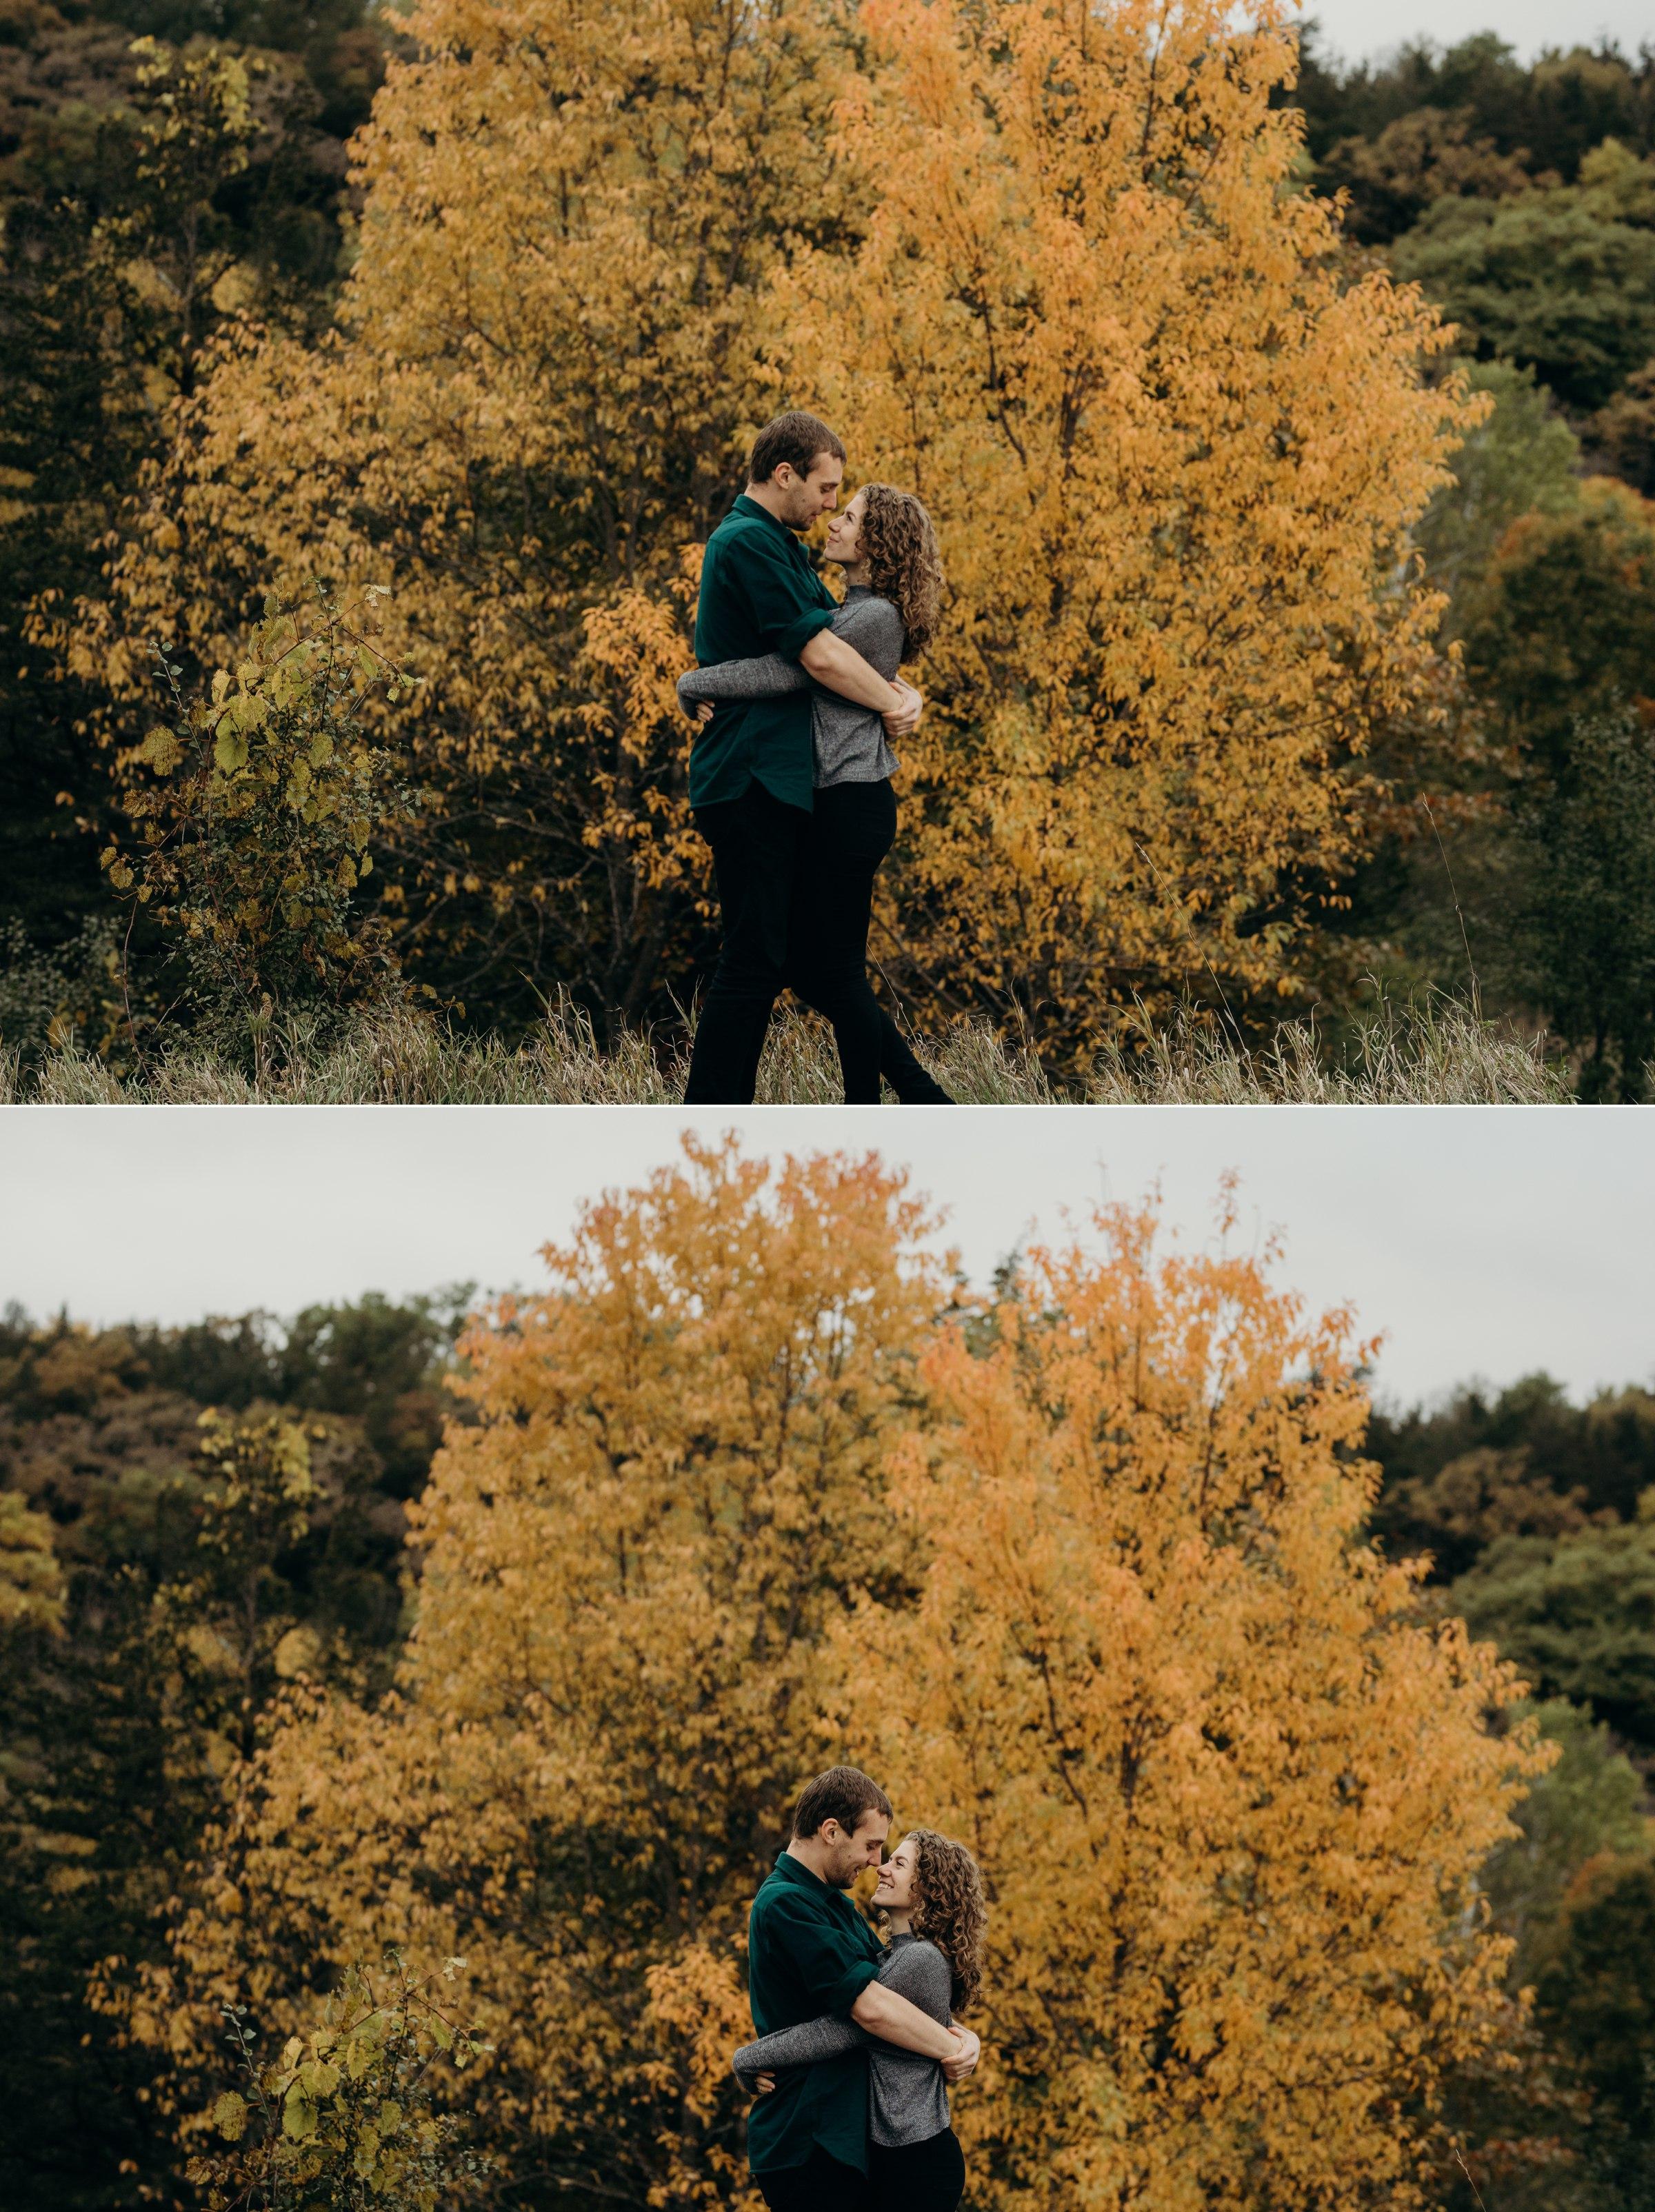 nickmezaphotography-austin-minneapolis-wedding-photographer-elopement-best-intimate-adventurous-destination-texas-minnesota-engagement-jess-dan-spacesaver_0166.jpg